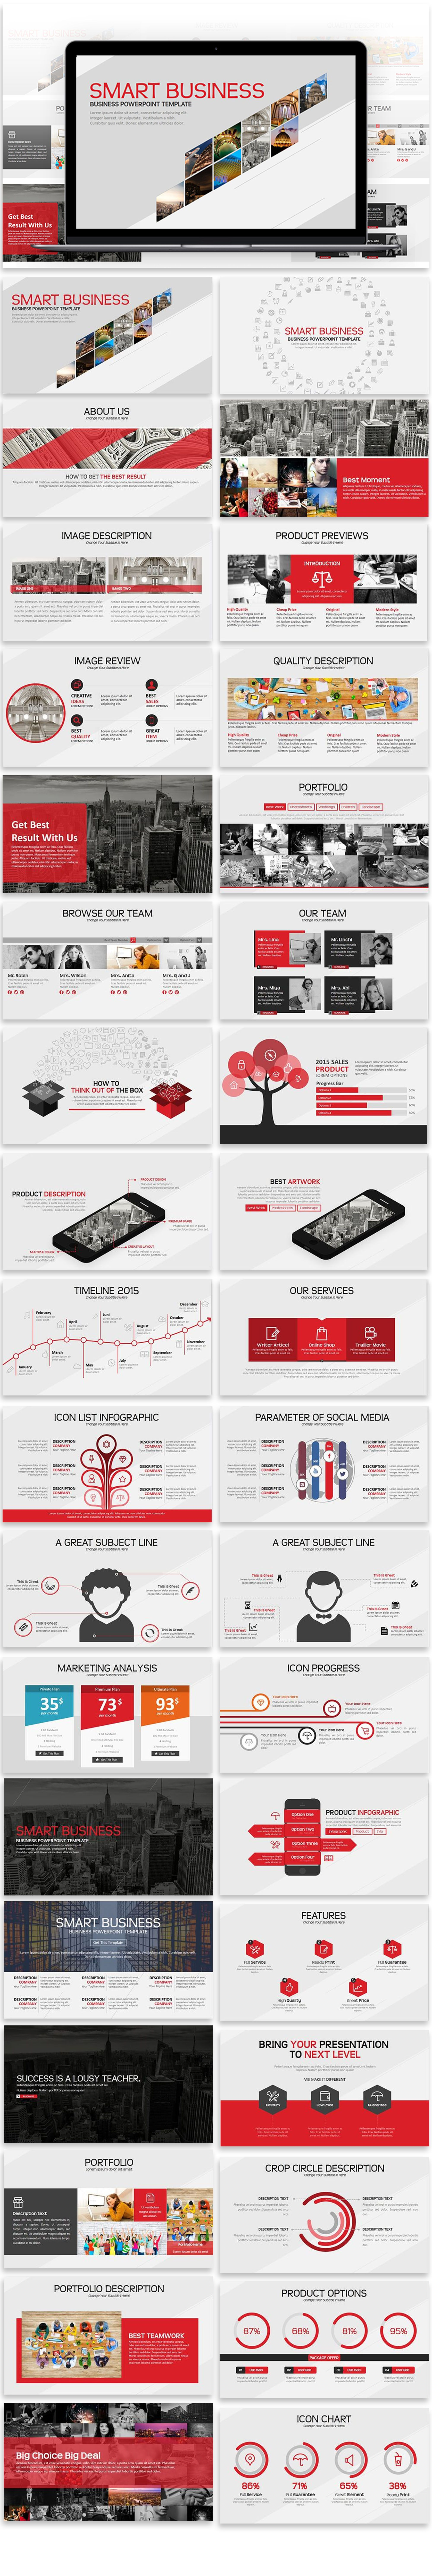 Smart Business Powerpoint Template Powerpoint Presentation